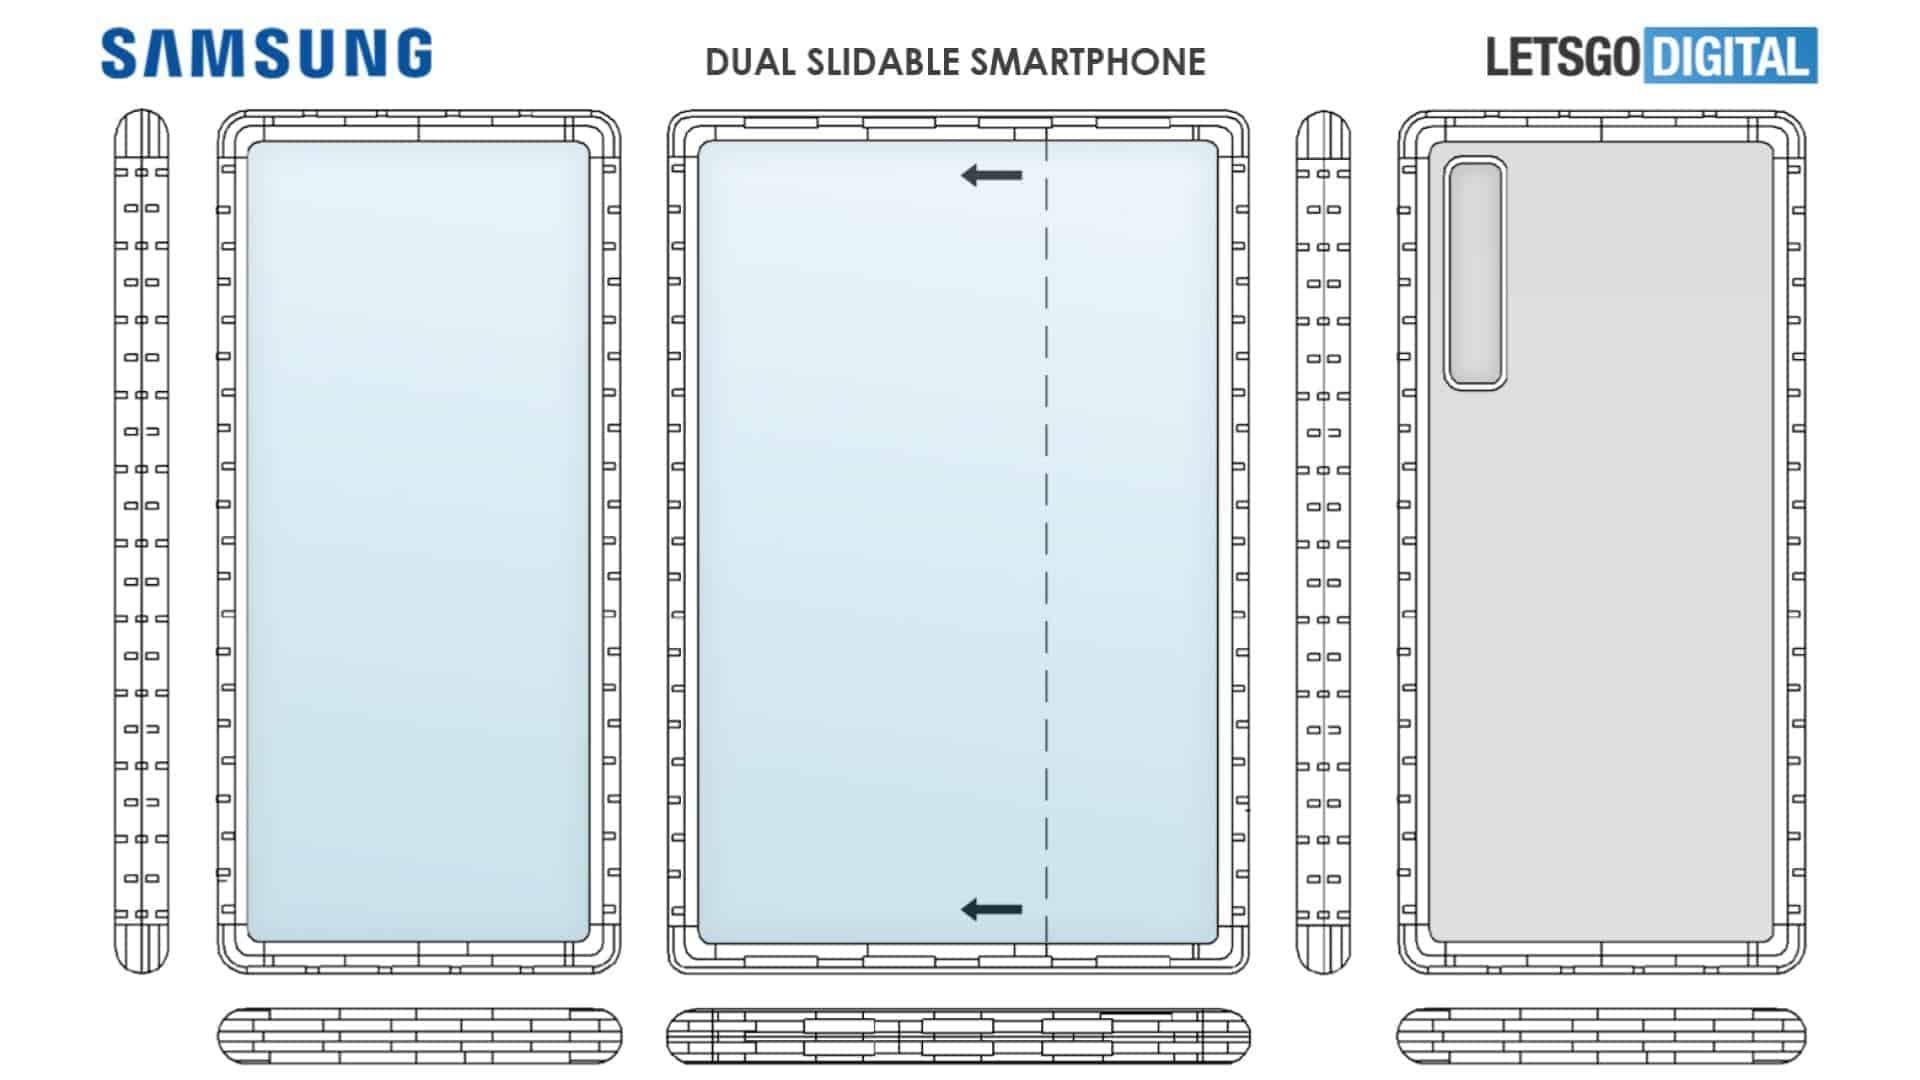 01 Dual Sliding Smartphone Samsung patent from LetsGoDigital